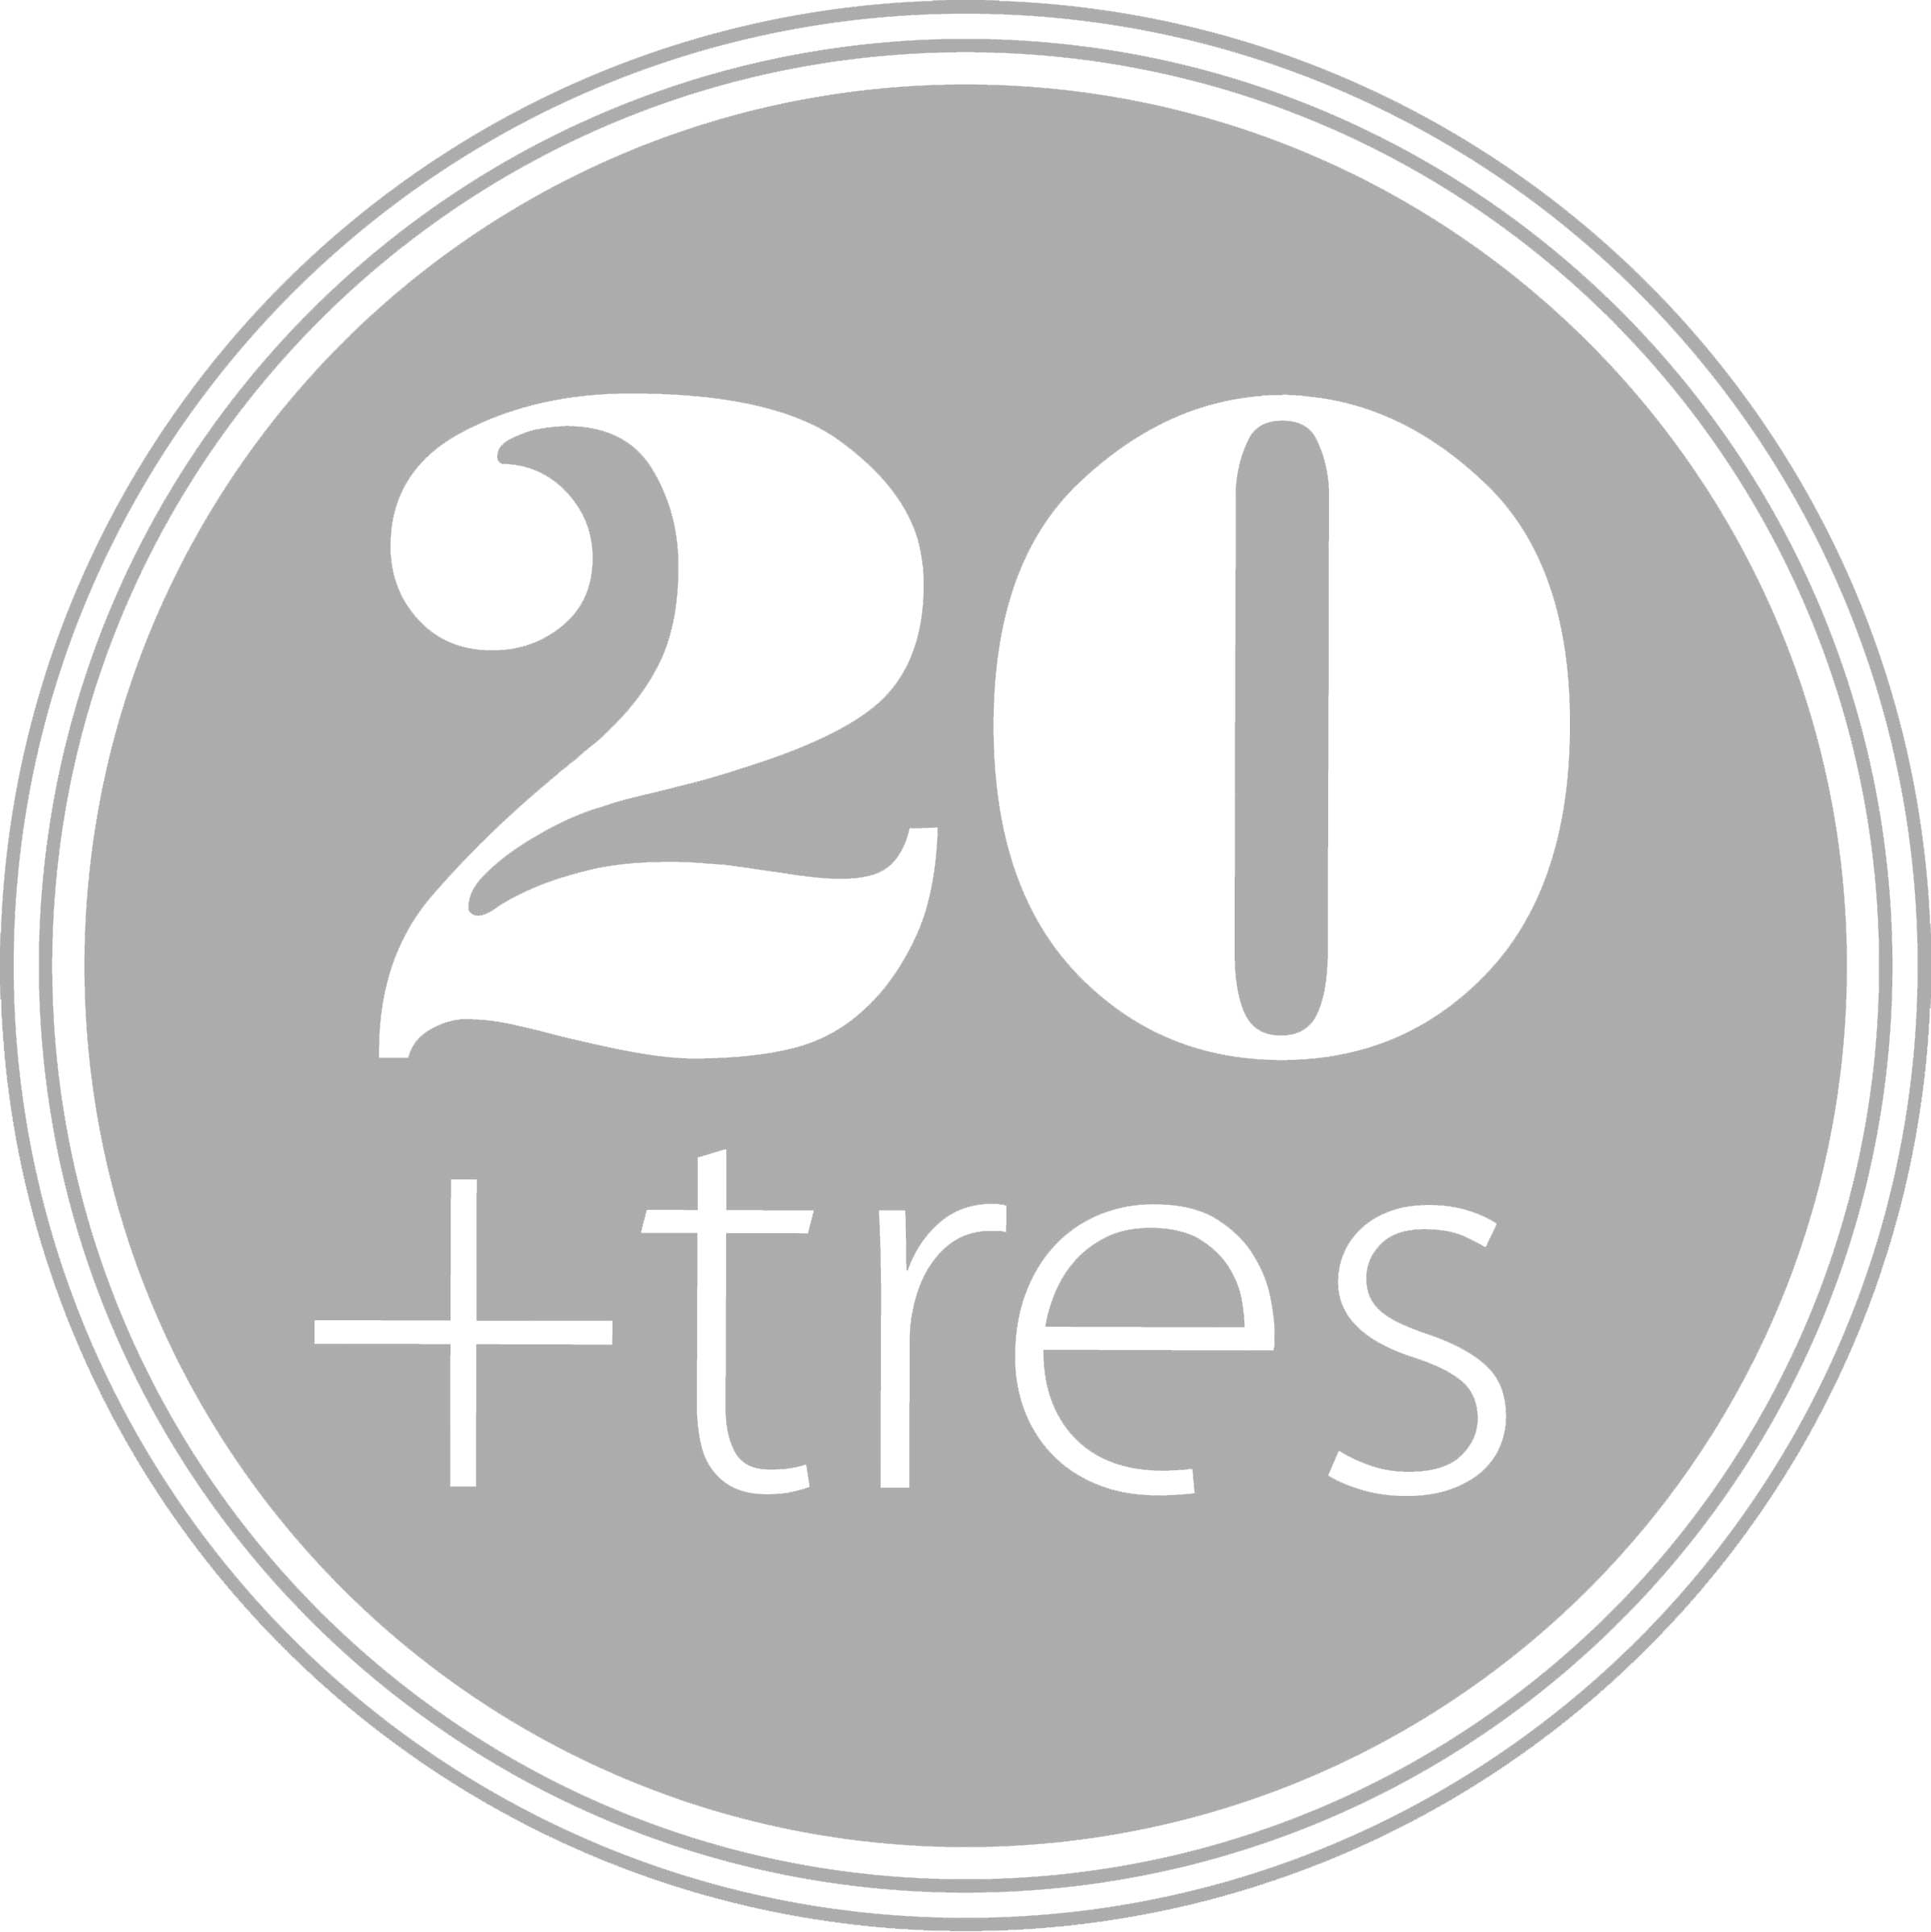 20mas3-web-toc